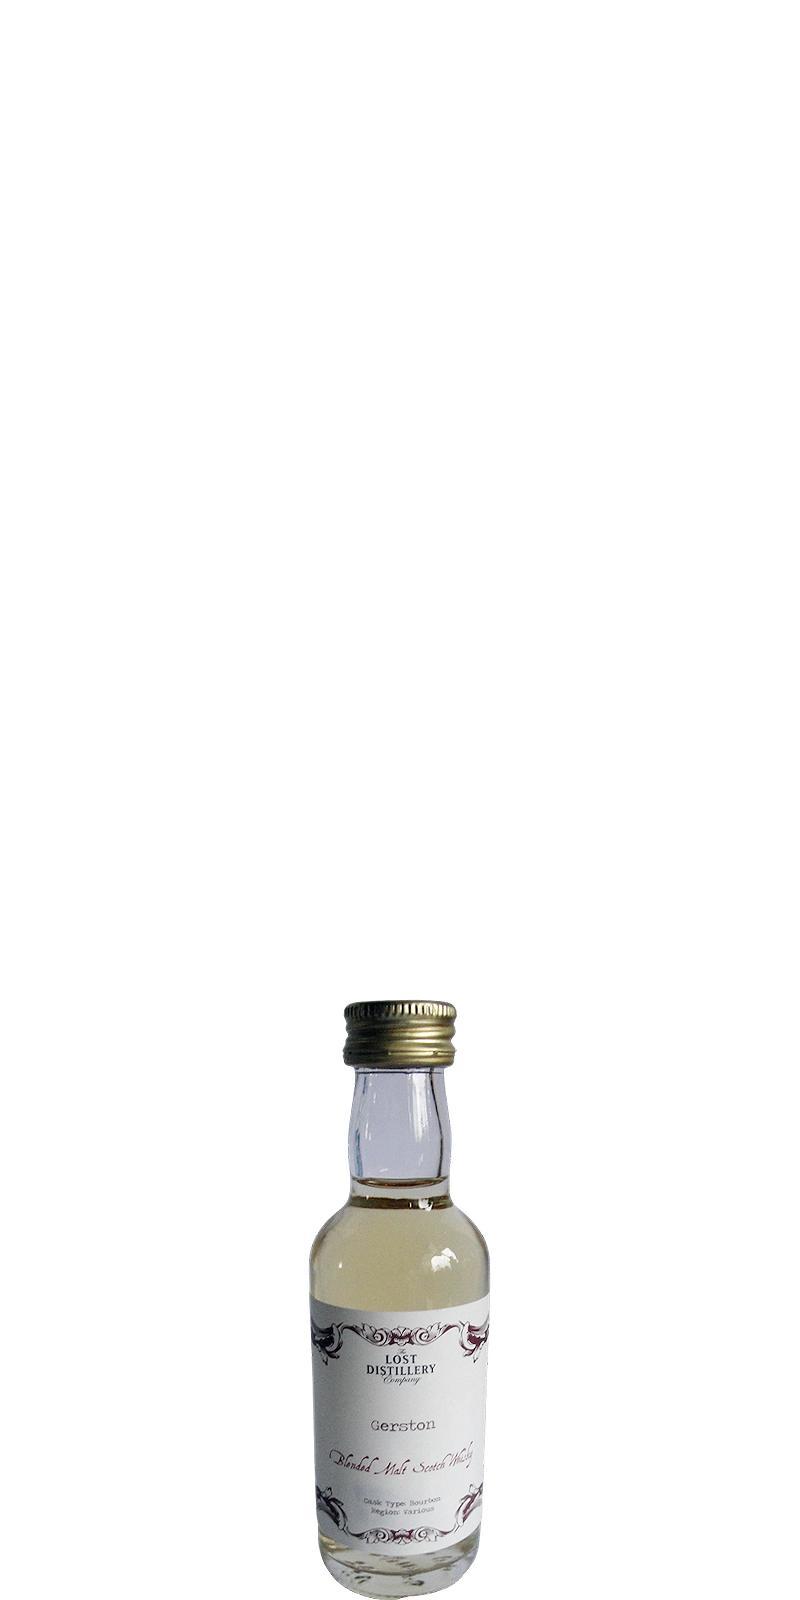 Gerston Blended  Malt Scotch Whisky